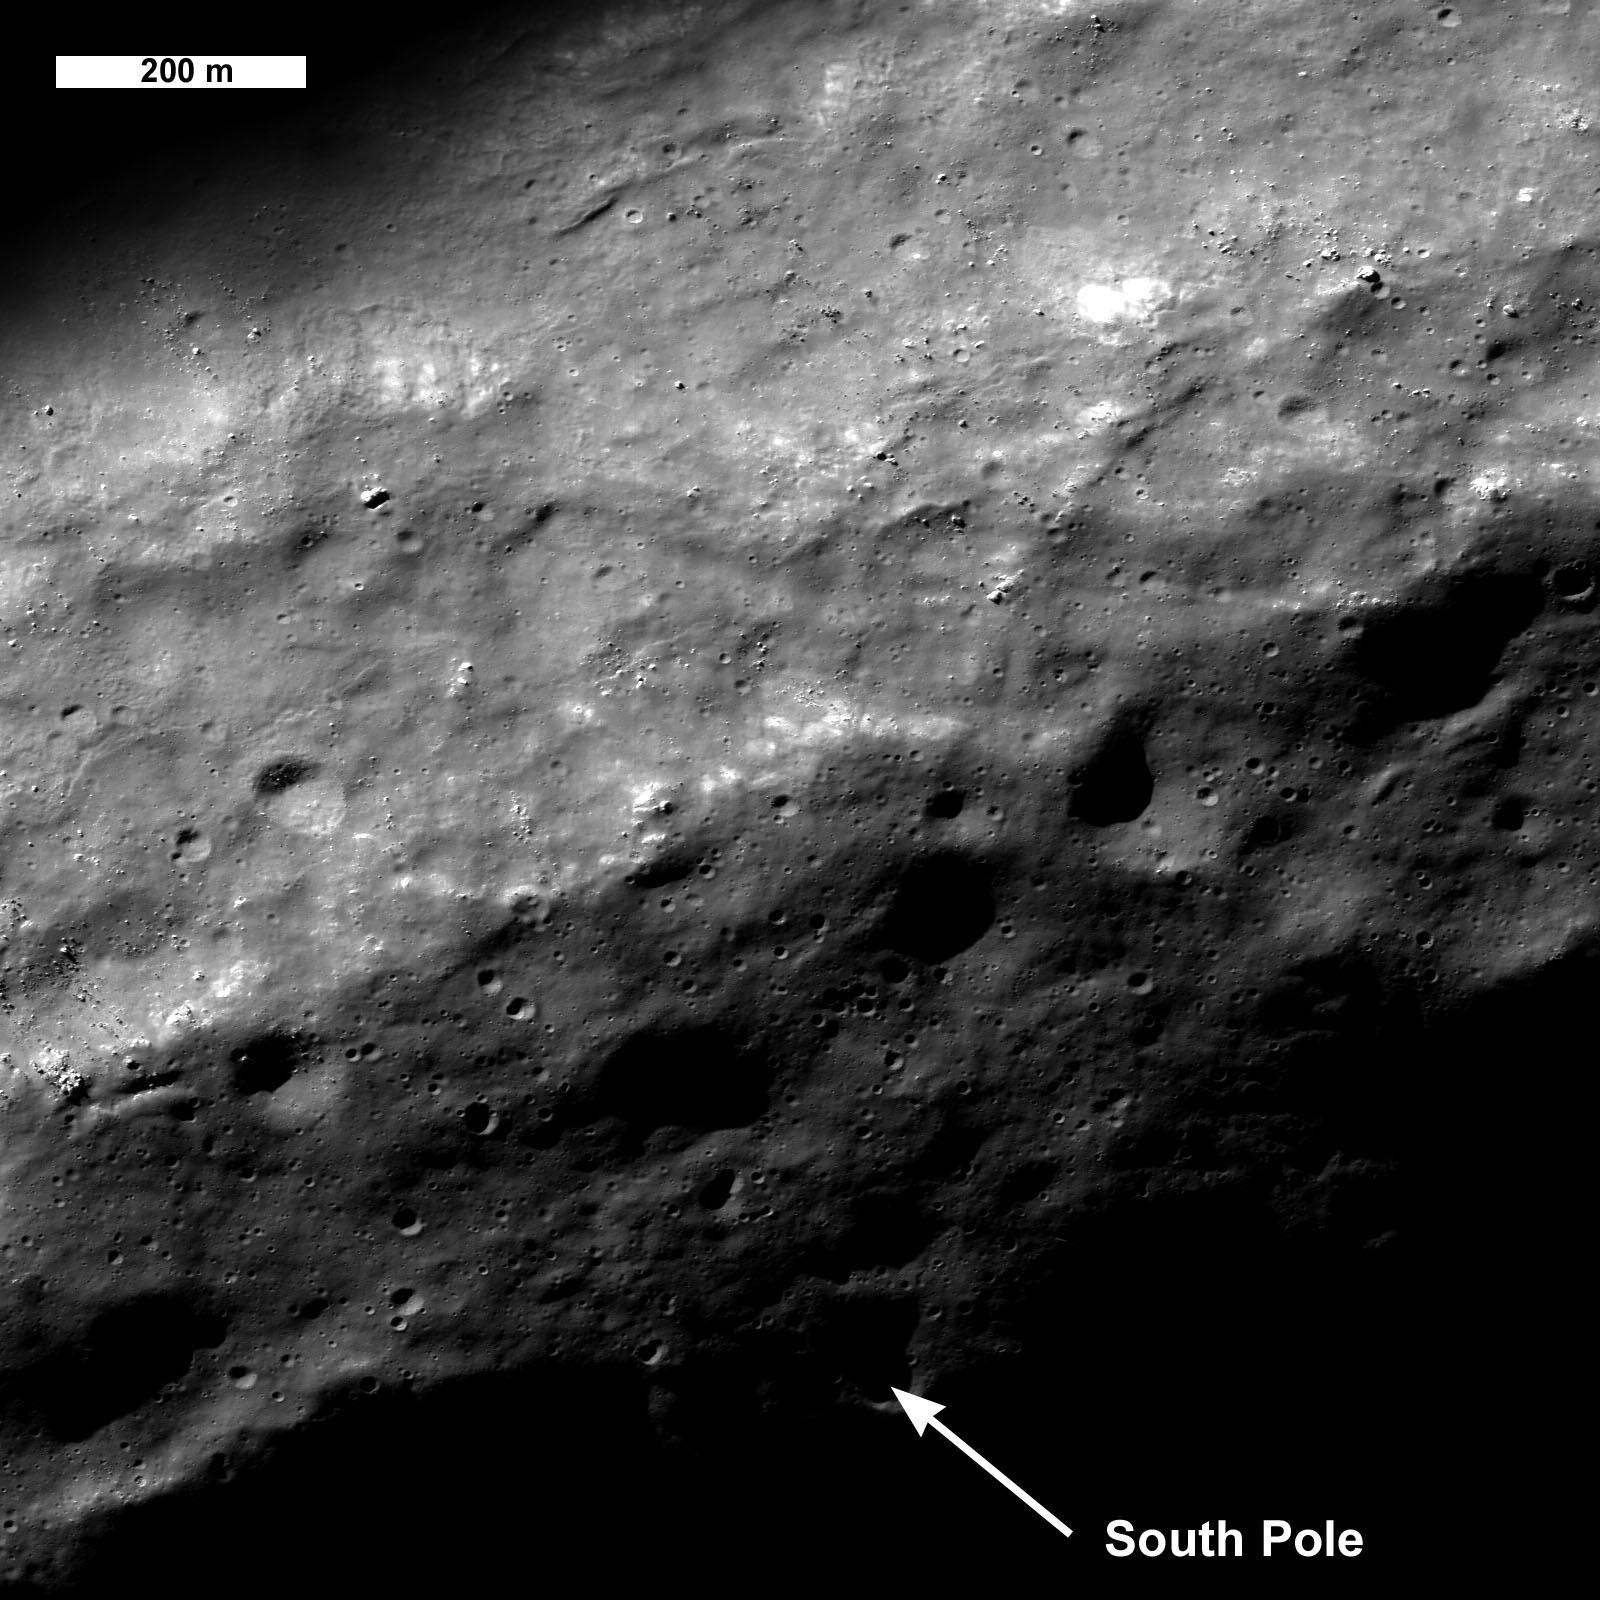 NASA: Lunar orbiter begins mapping, studying moon surface ...